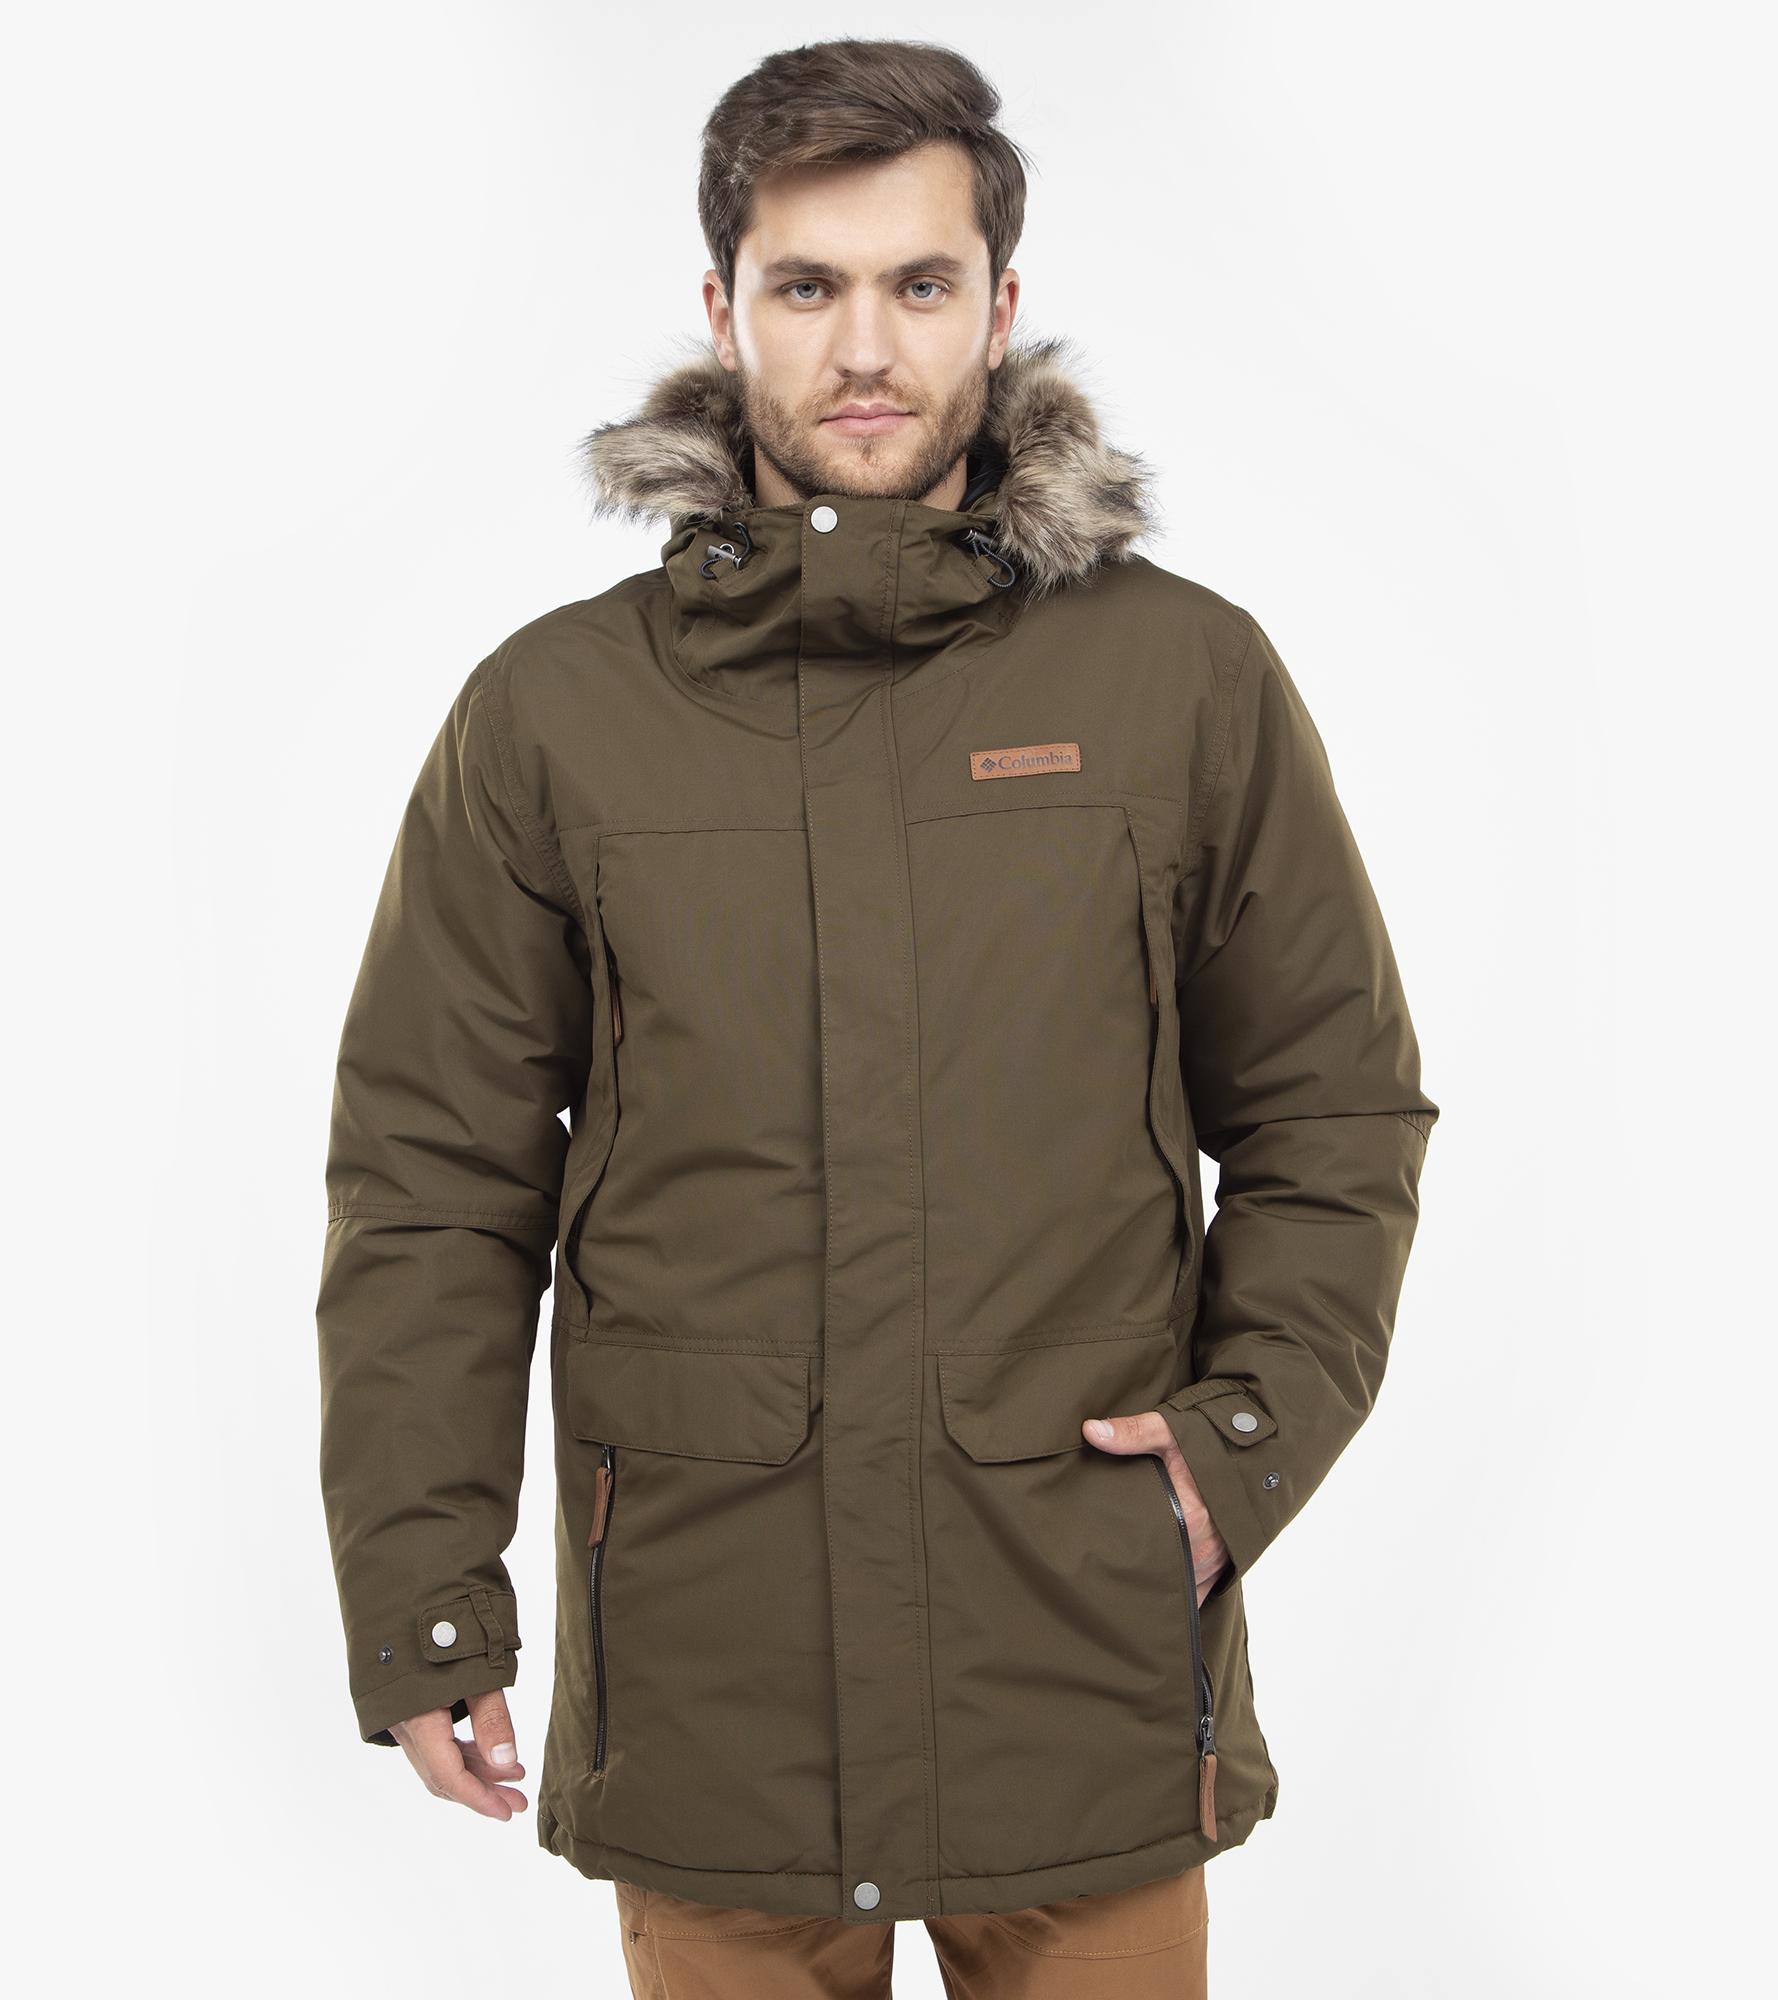 Columbia Куртка пуховая мужская Columbia South Canyon, размер 52-54 цена